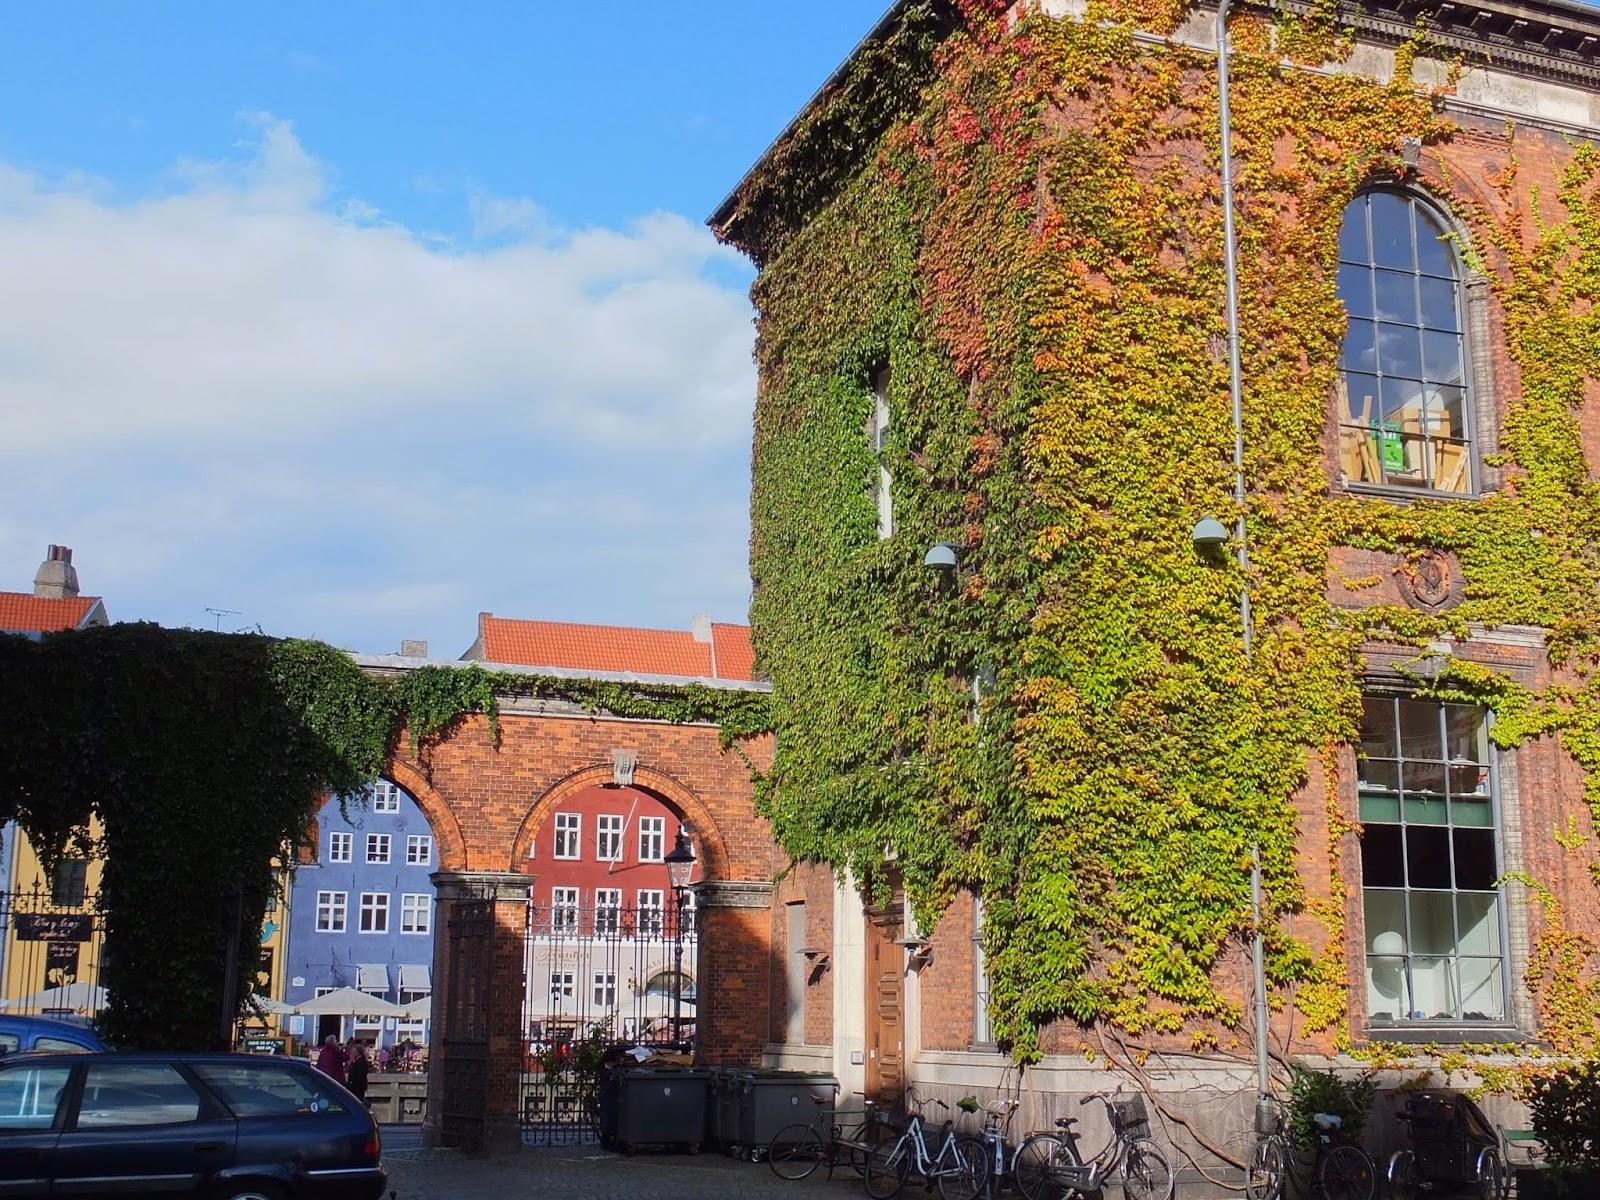 copenhagen-road コペンハーゲンの街中7